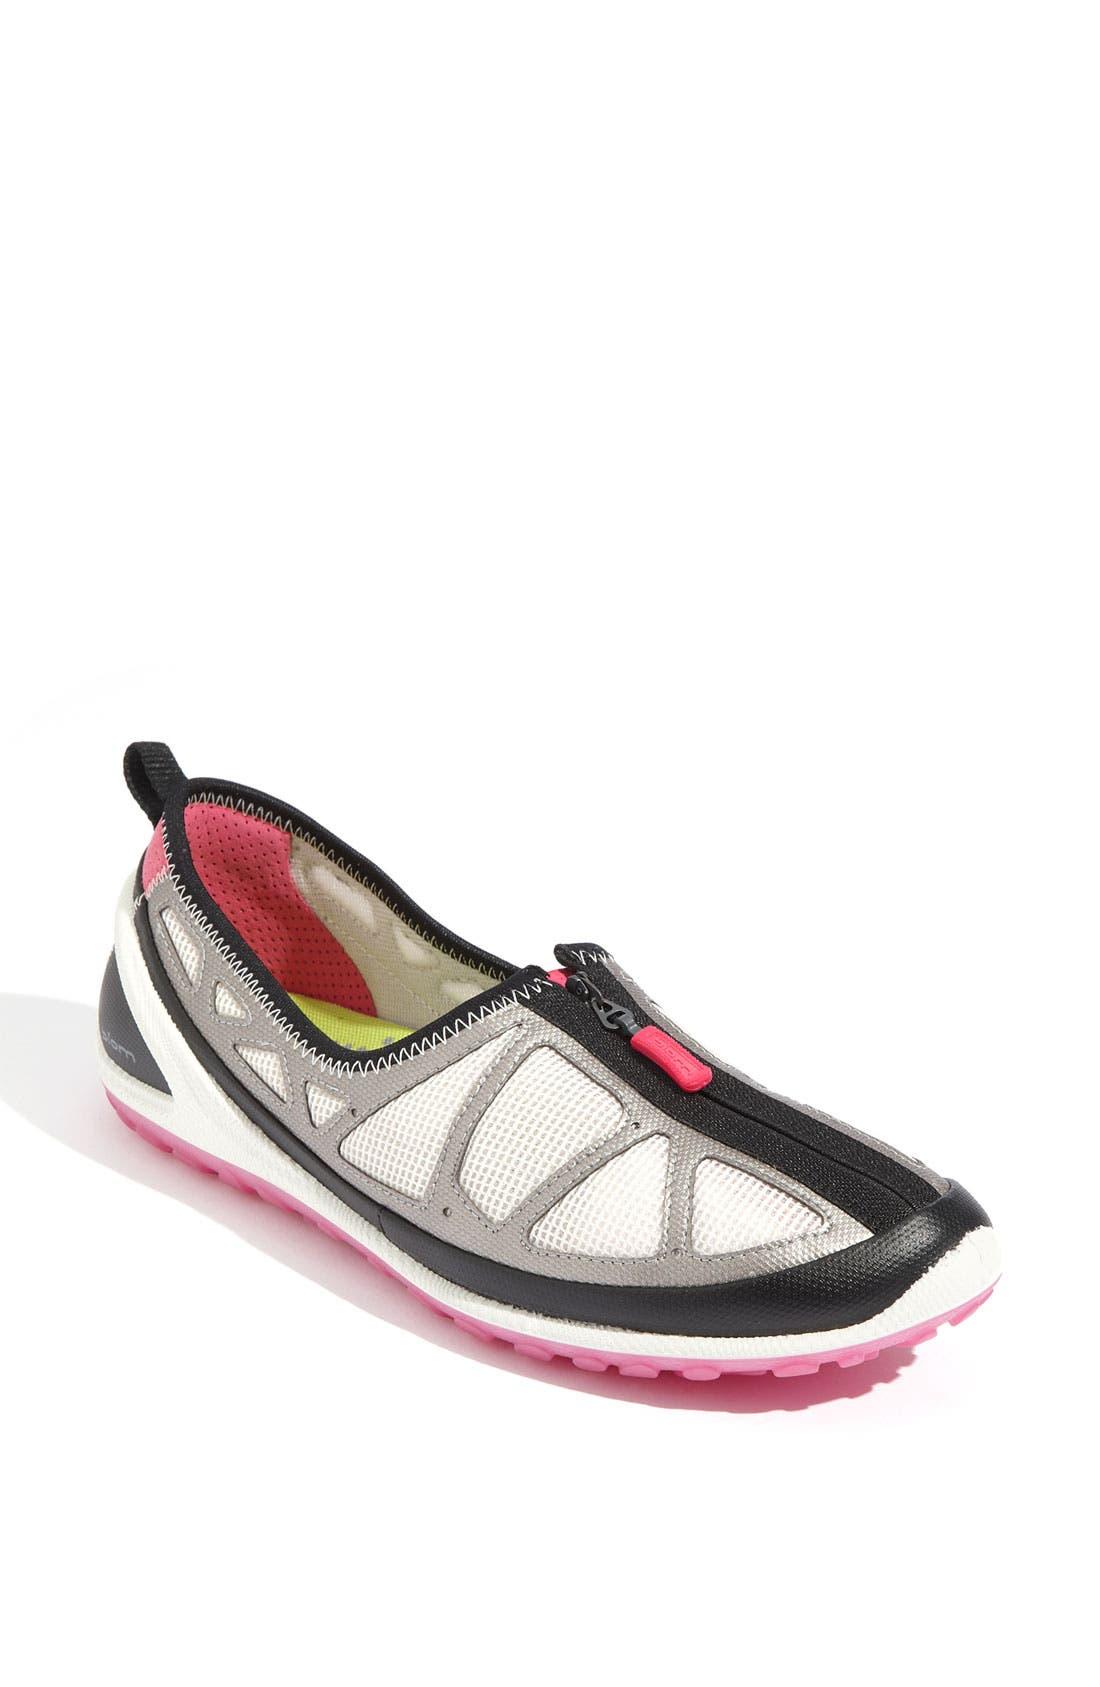 Main Image - ECCO 'Biom Lite Zip' Sneaker (Women)